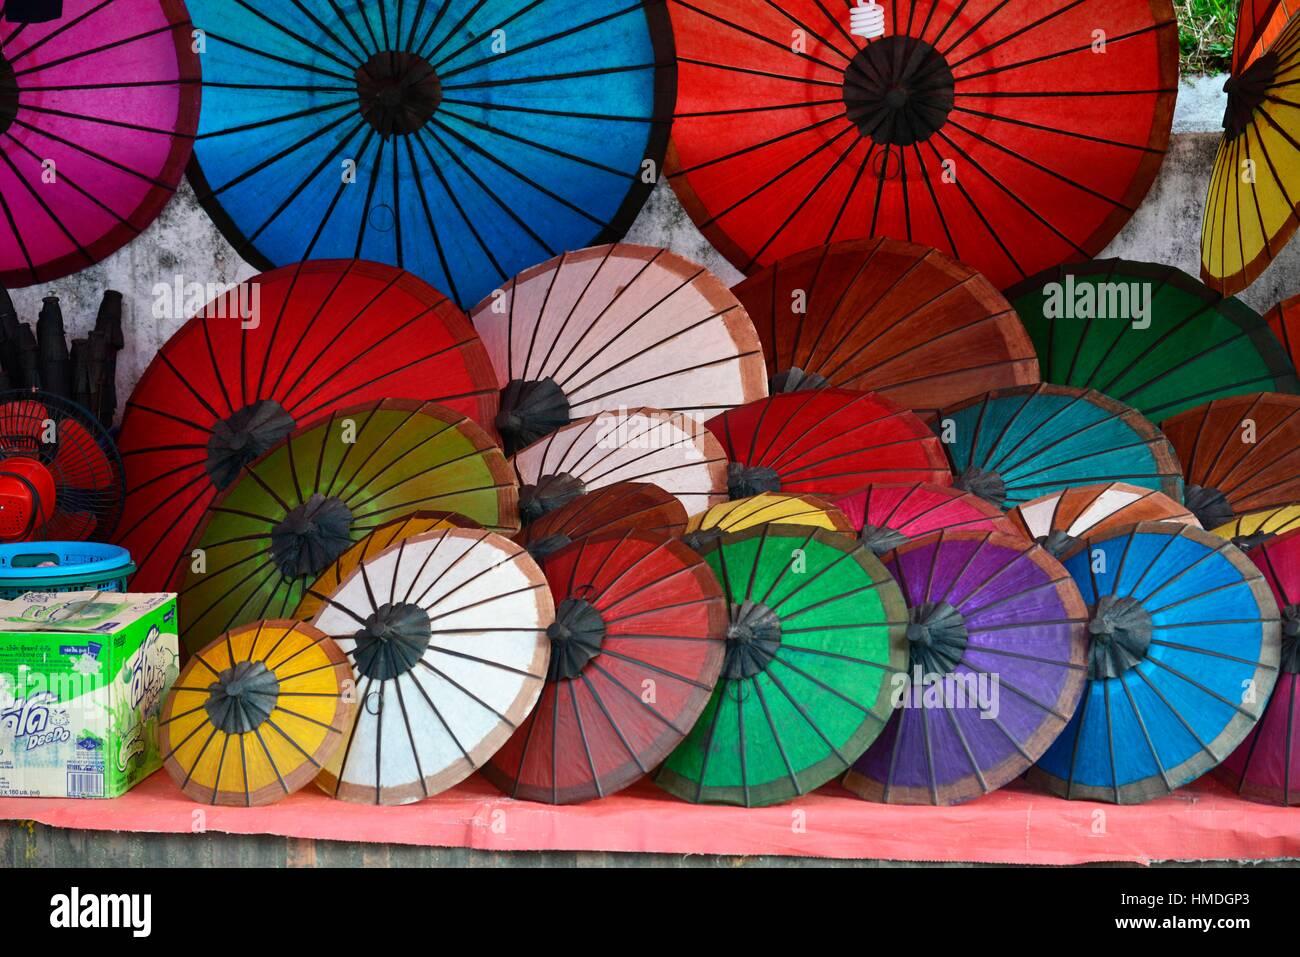 Asiatische Sonnenschirme bunte handgemachte asiatische sonnenschirme auf dem display an